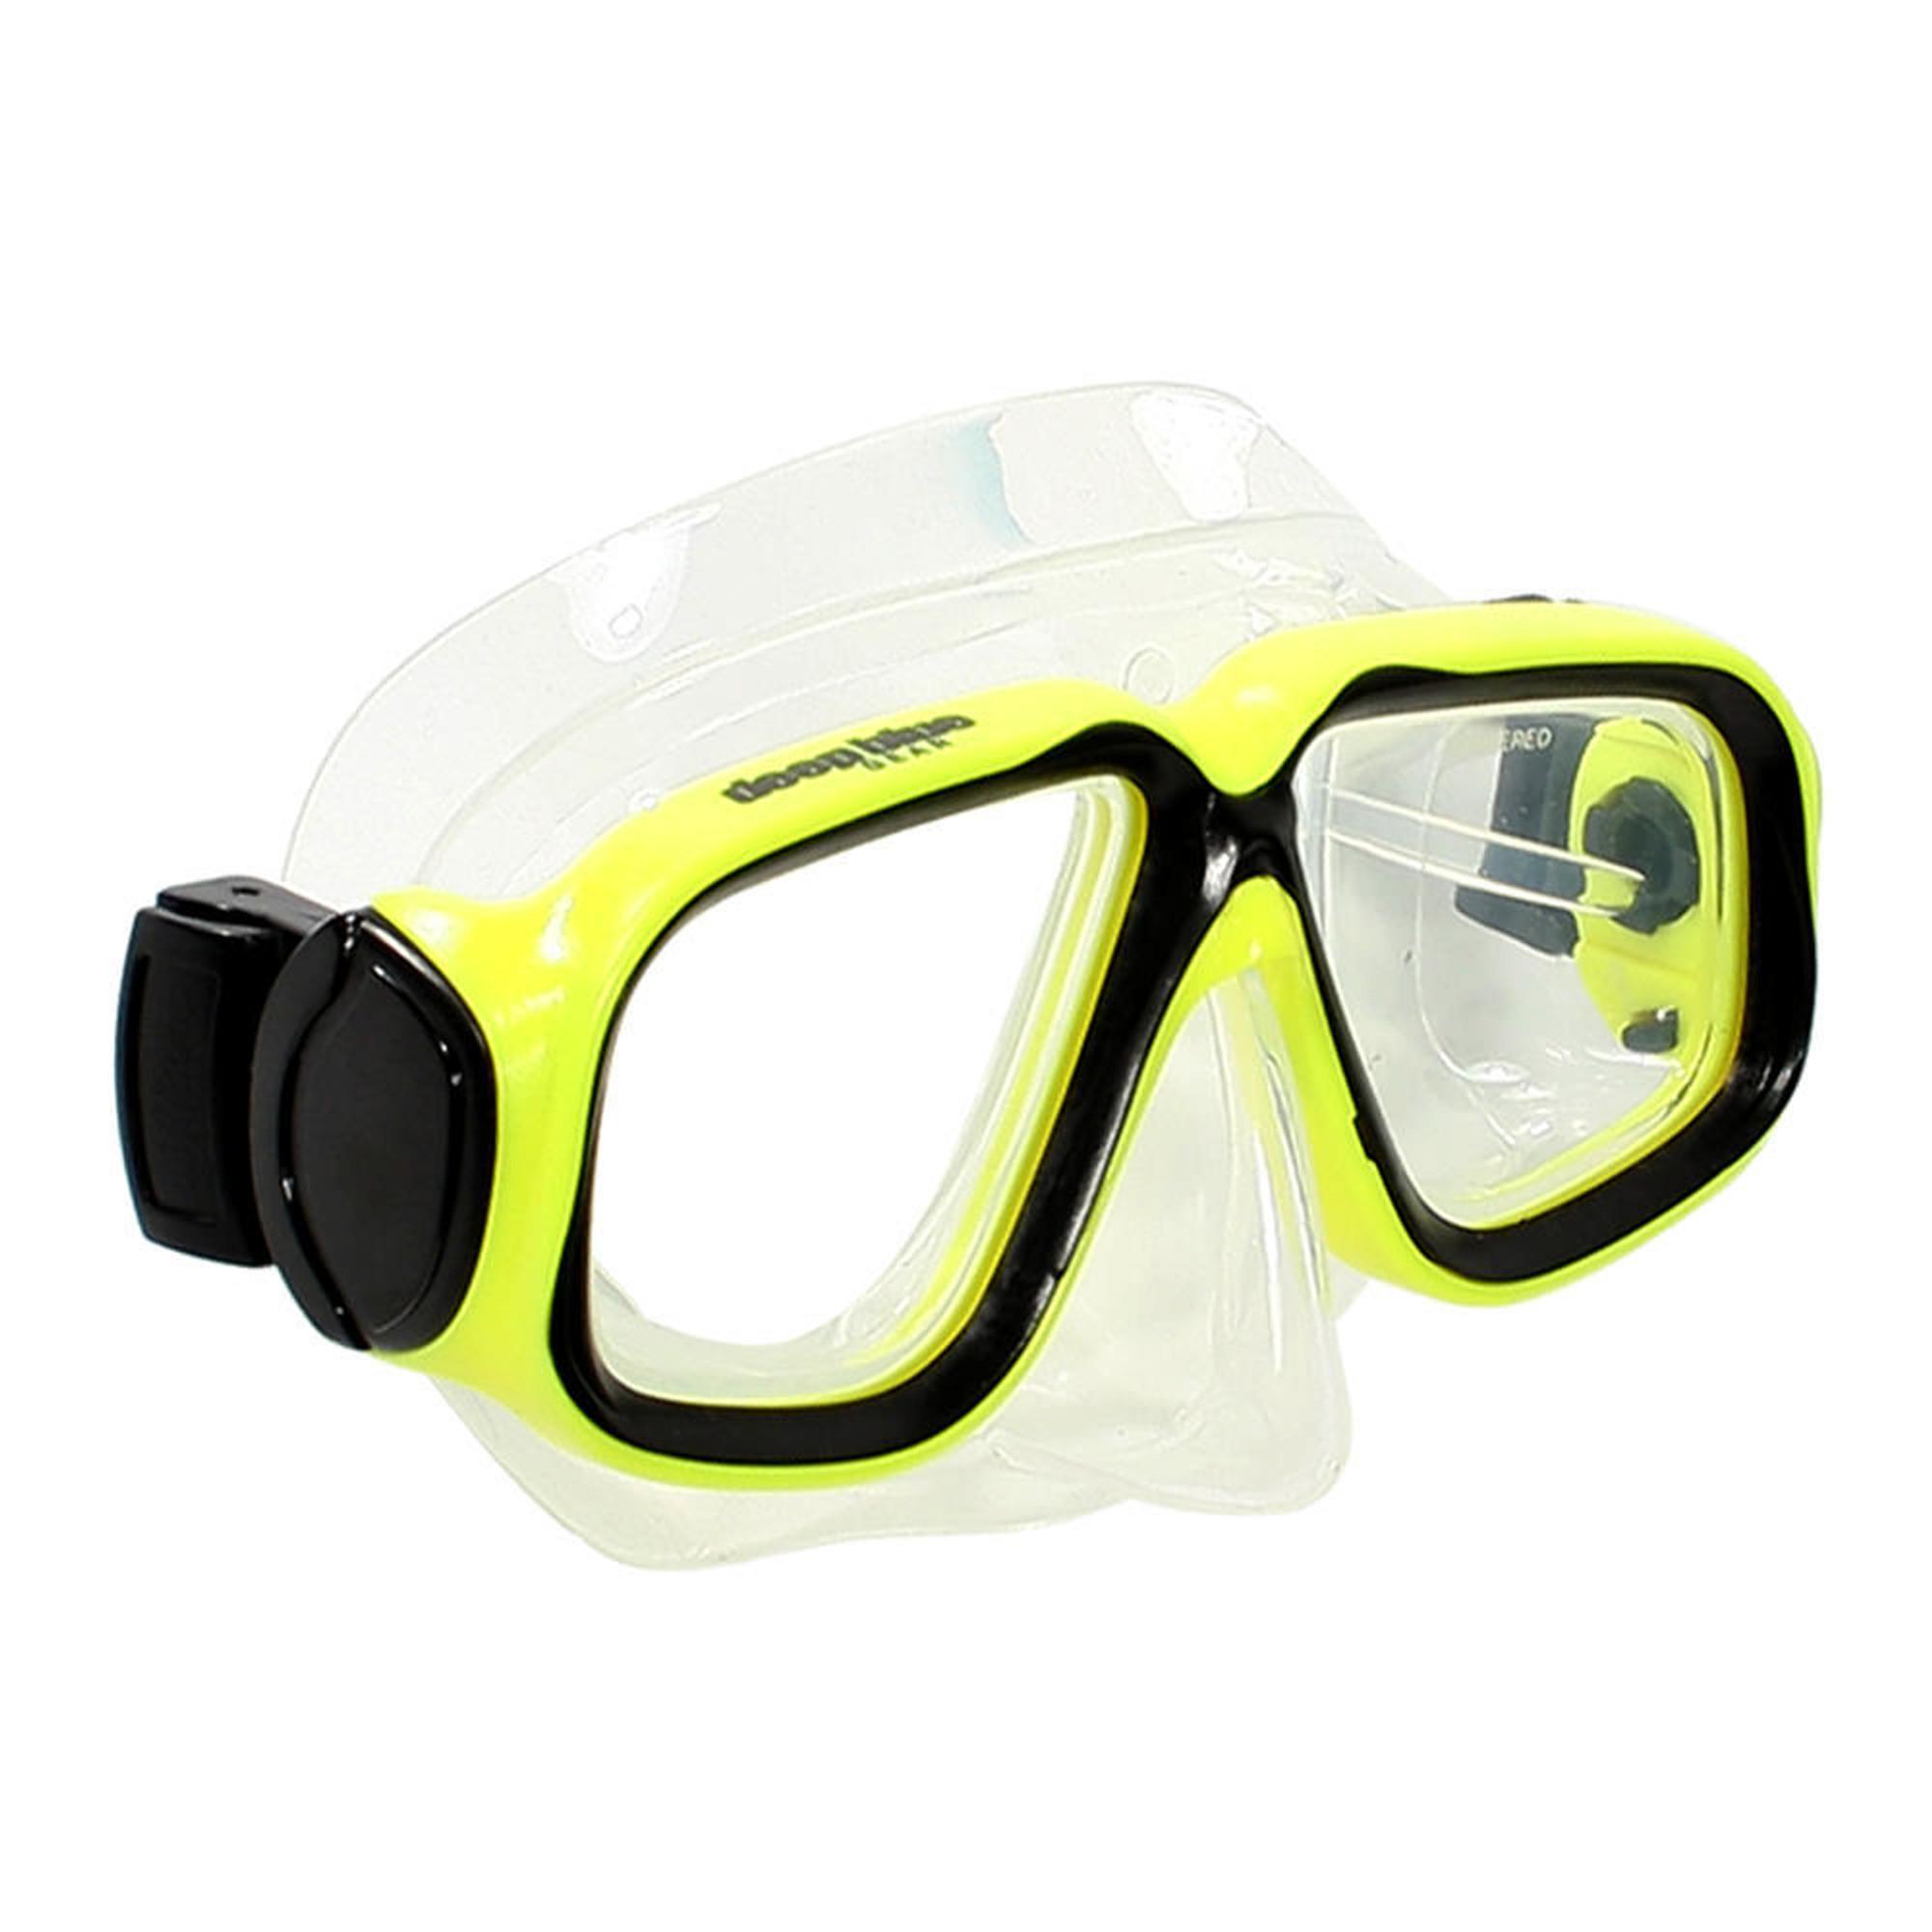 Maui Junior - Kids Mask and Snorkel Set